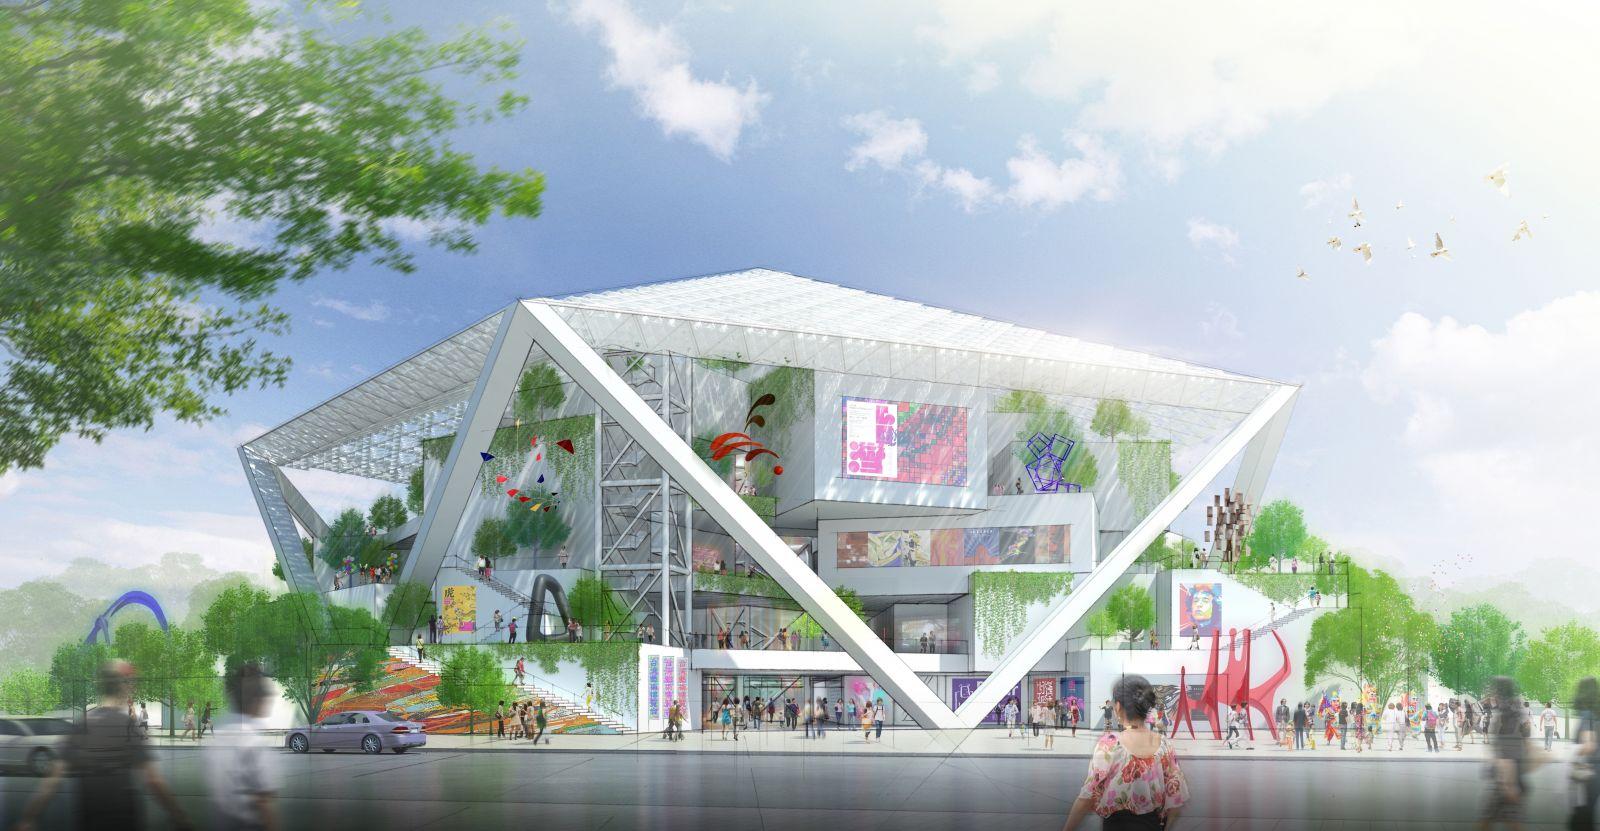 Tainan museum of fine arts